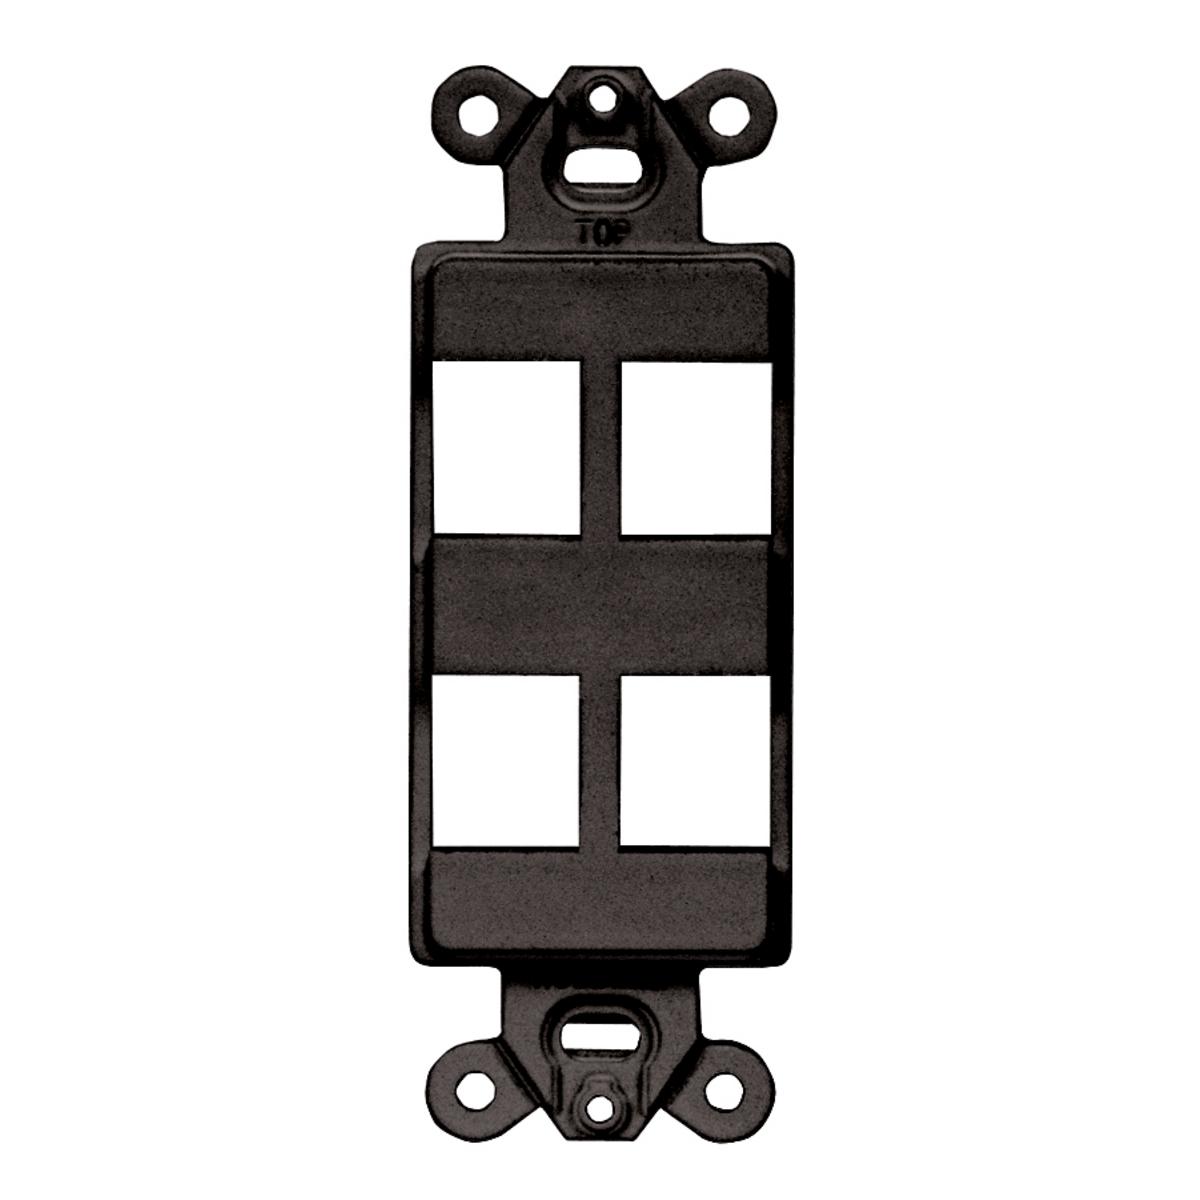 Hubbell ISF4BK Decorator Outlet Frame